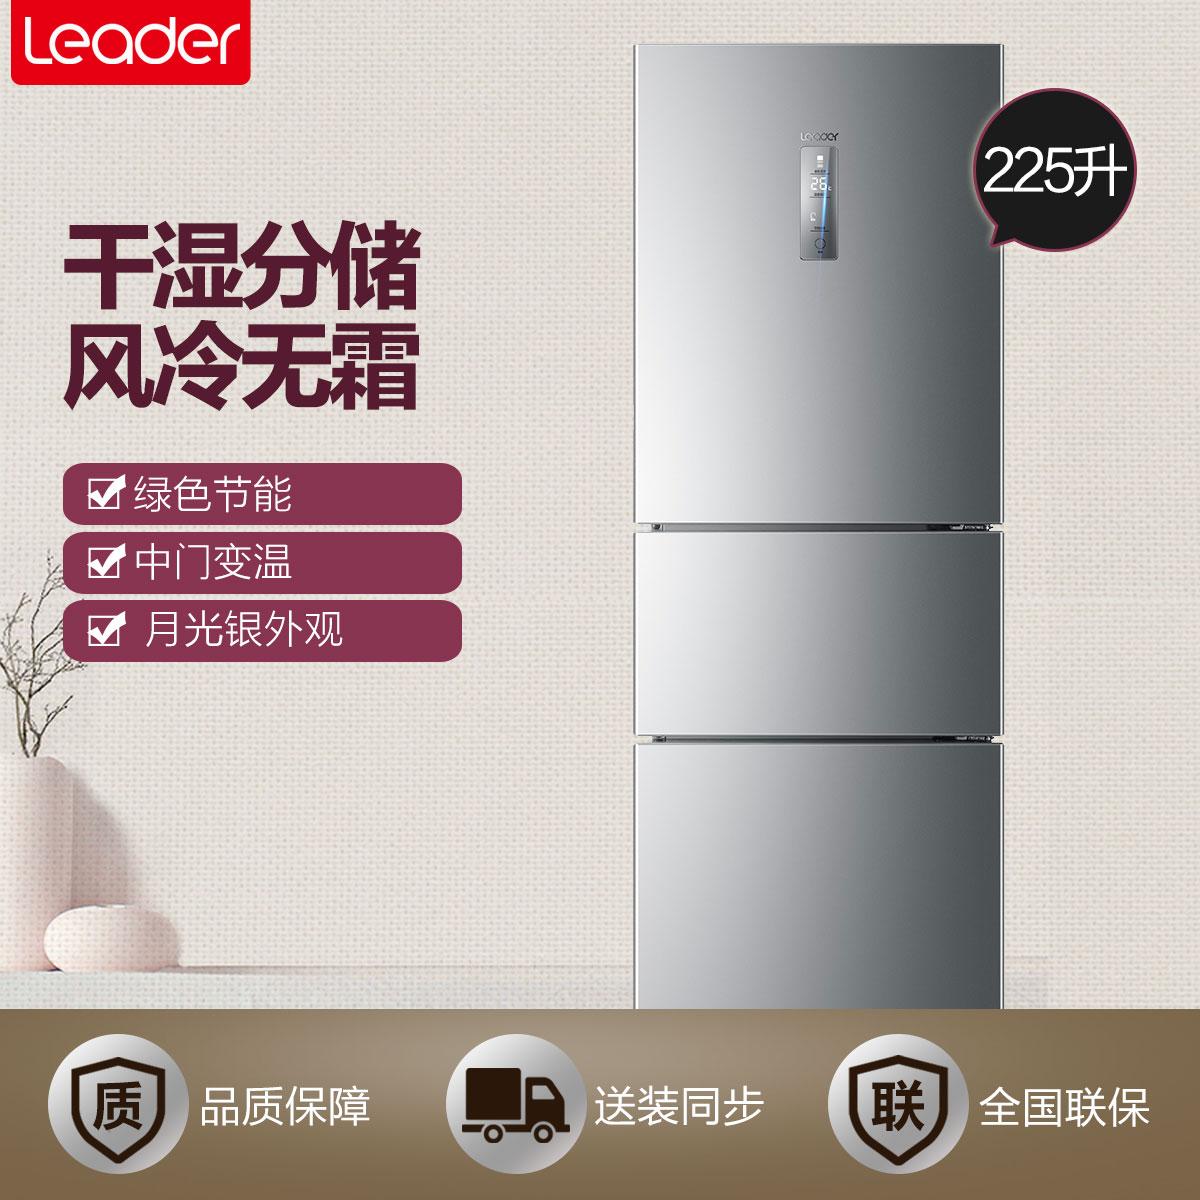 Leader/统帅 冰箱 BCD-225WLDPC